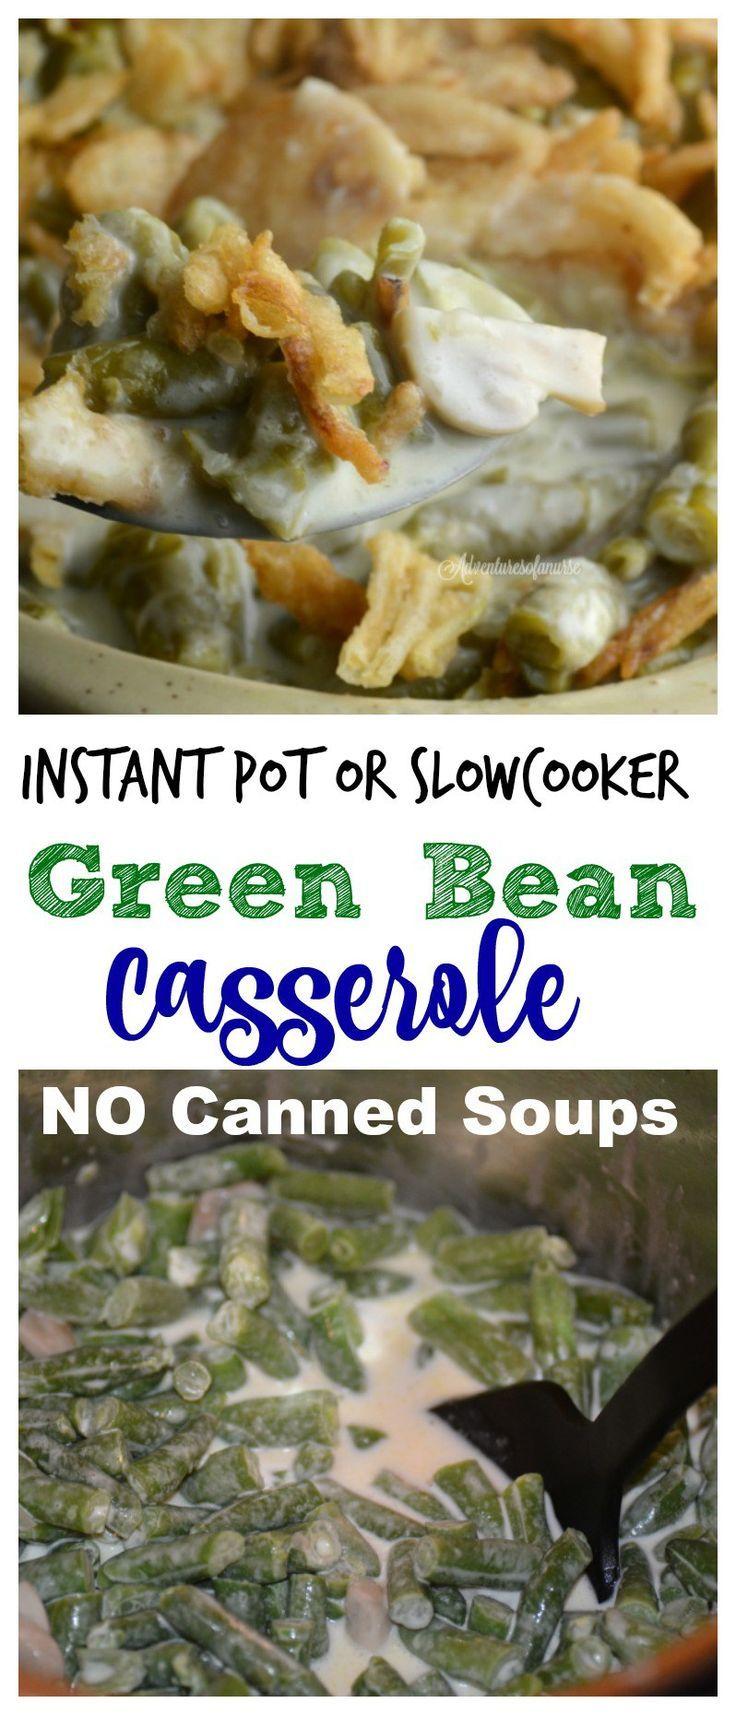 Instant Pot or Slow cooker Green Bean Casserole